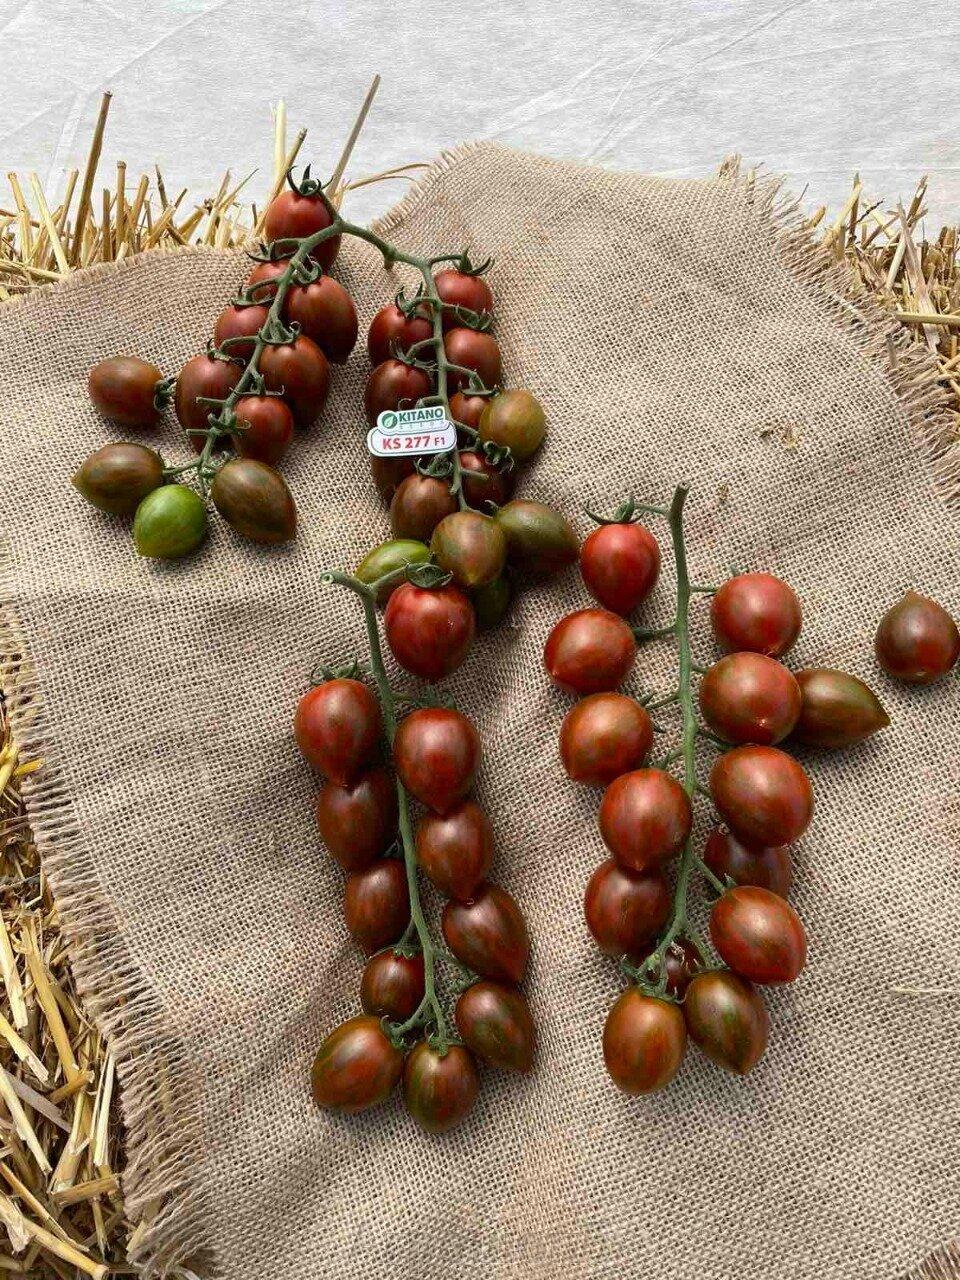 День поля по томатам от компании Kitano - фото pic_cb09818025c1d5e6579ebf990a4dea17_1920x9000_1.jpg